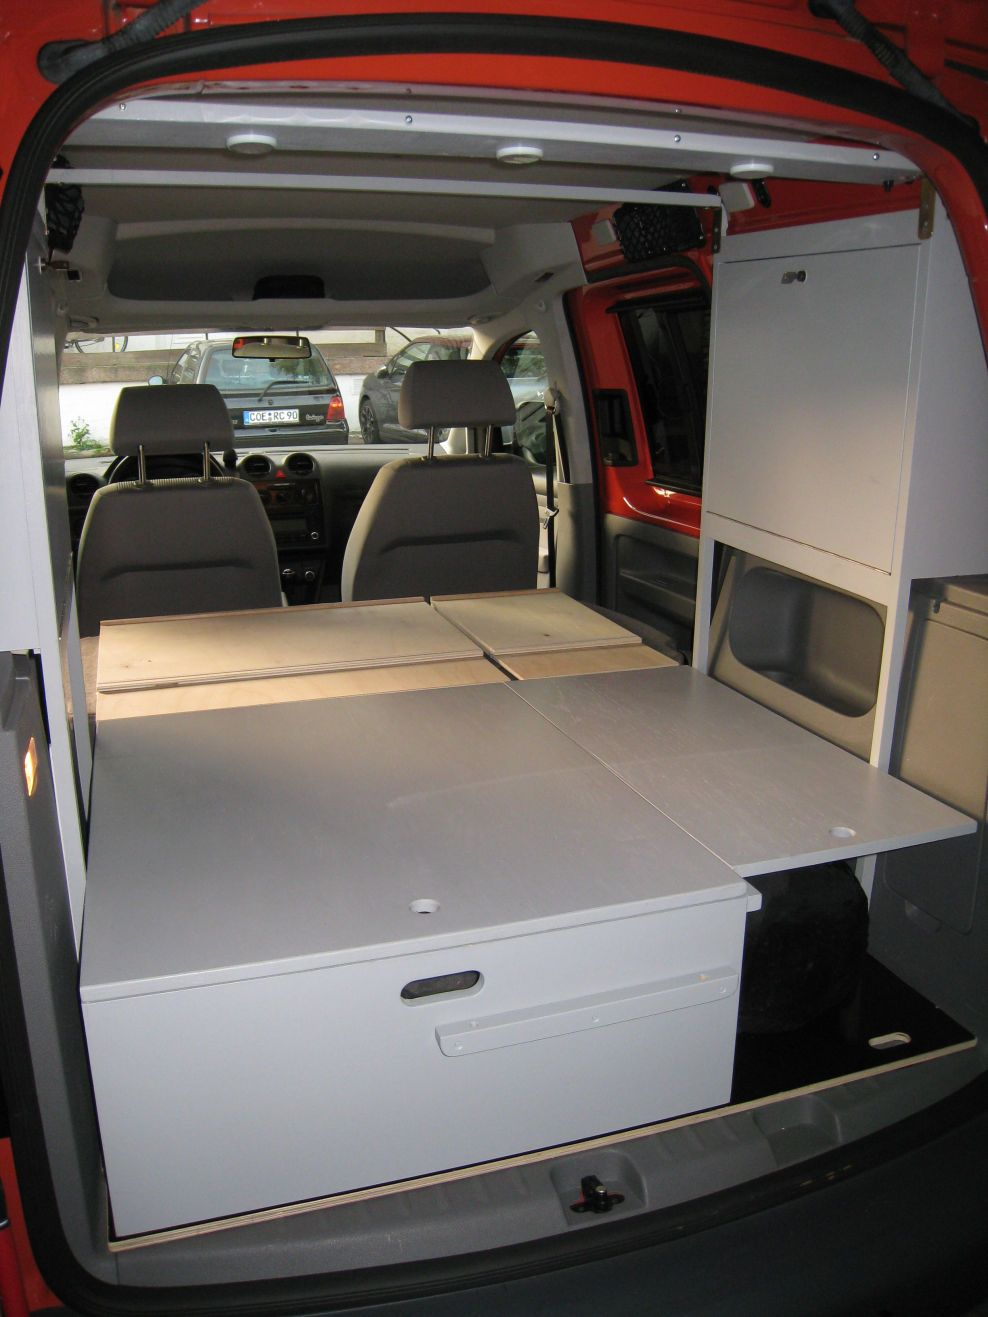 2012 10 20 vw caddy innenausbau 19 travelling mini. Black Bedroom Furniture Sets. Home Design Ideas